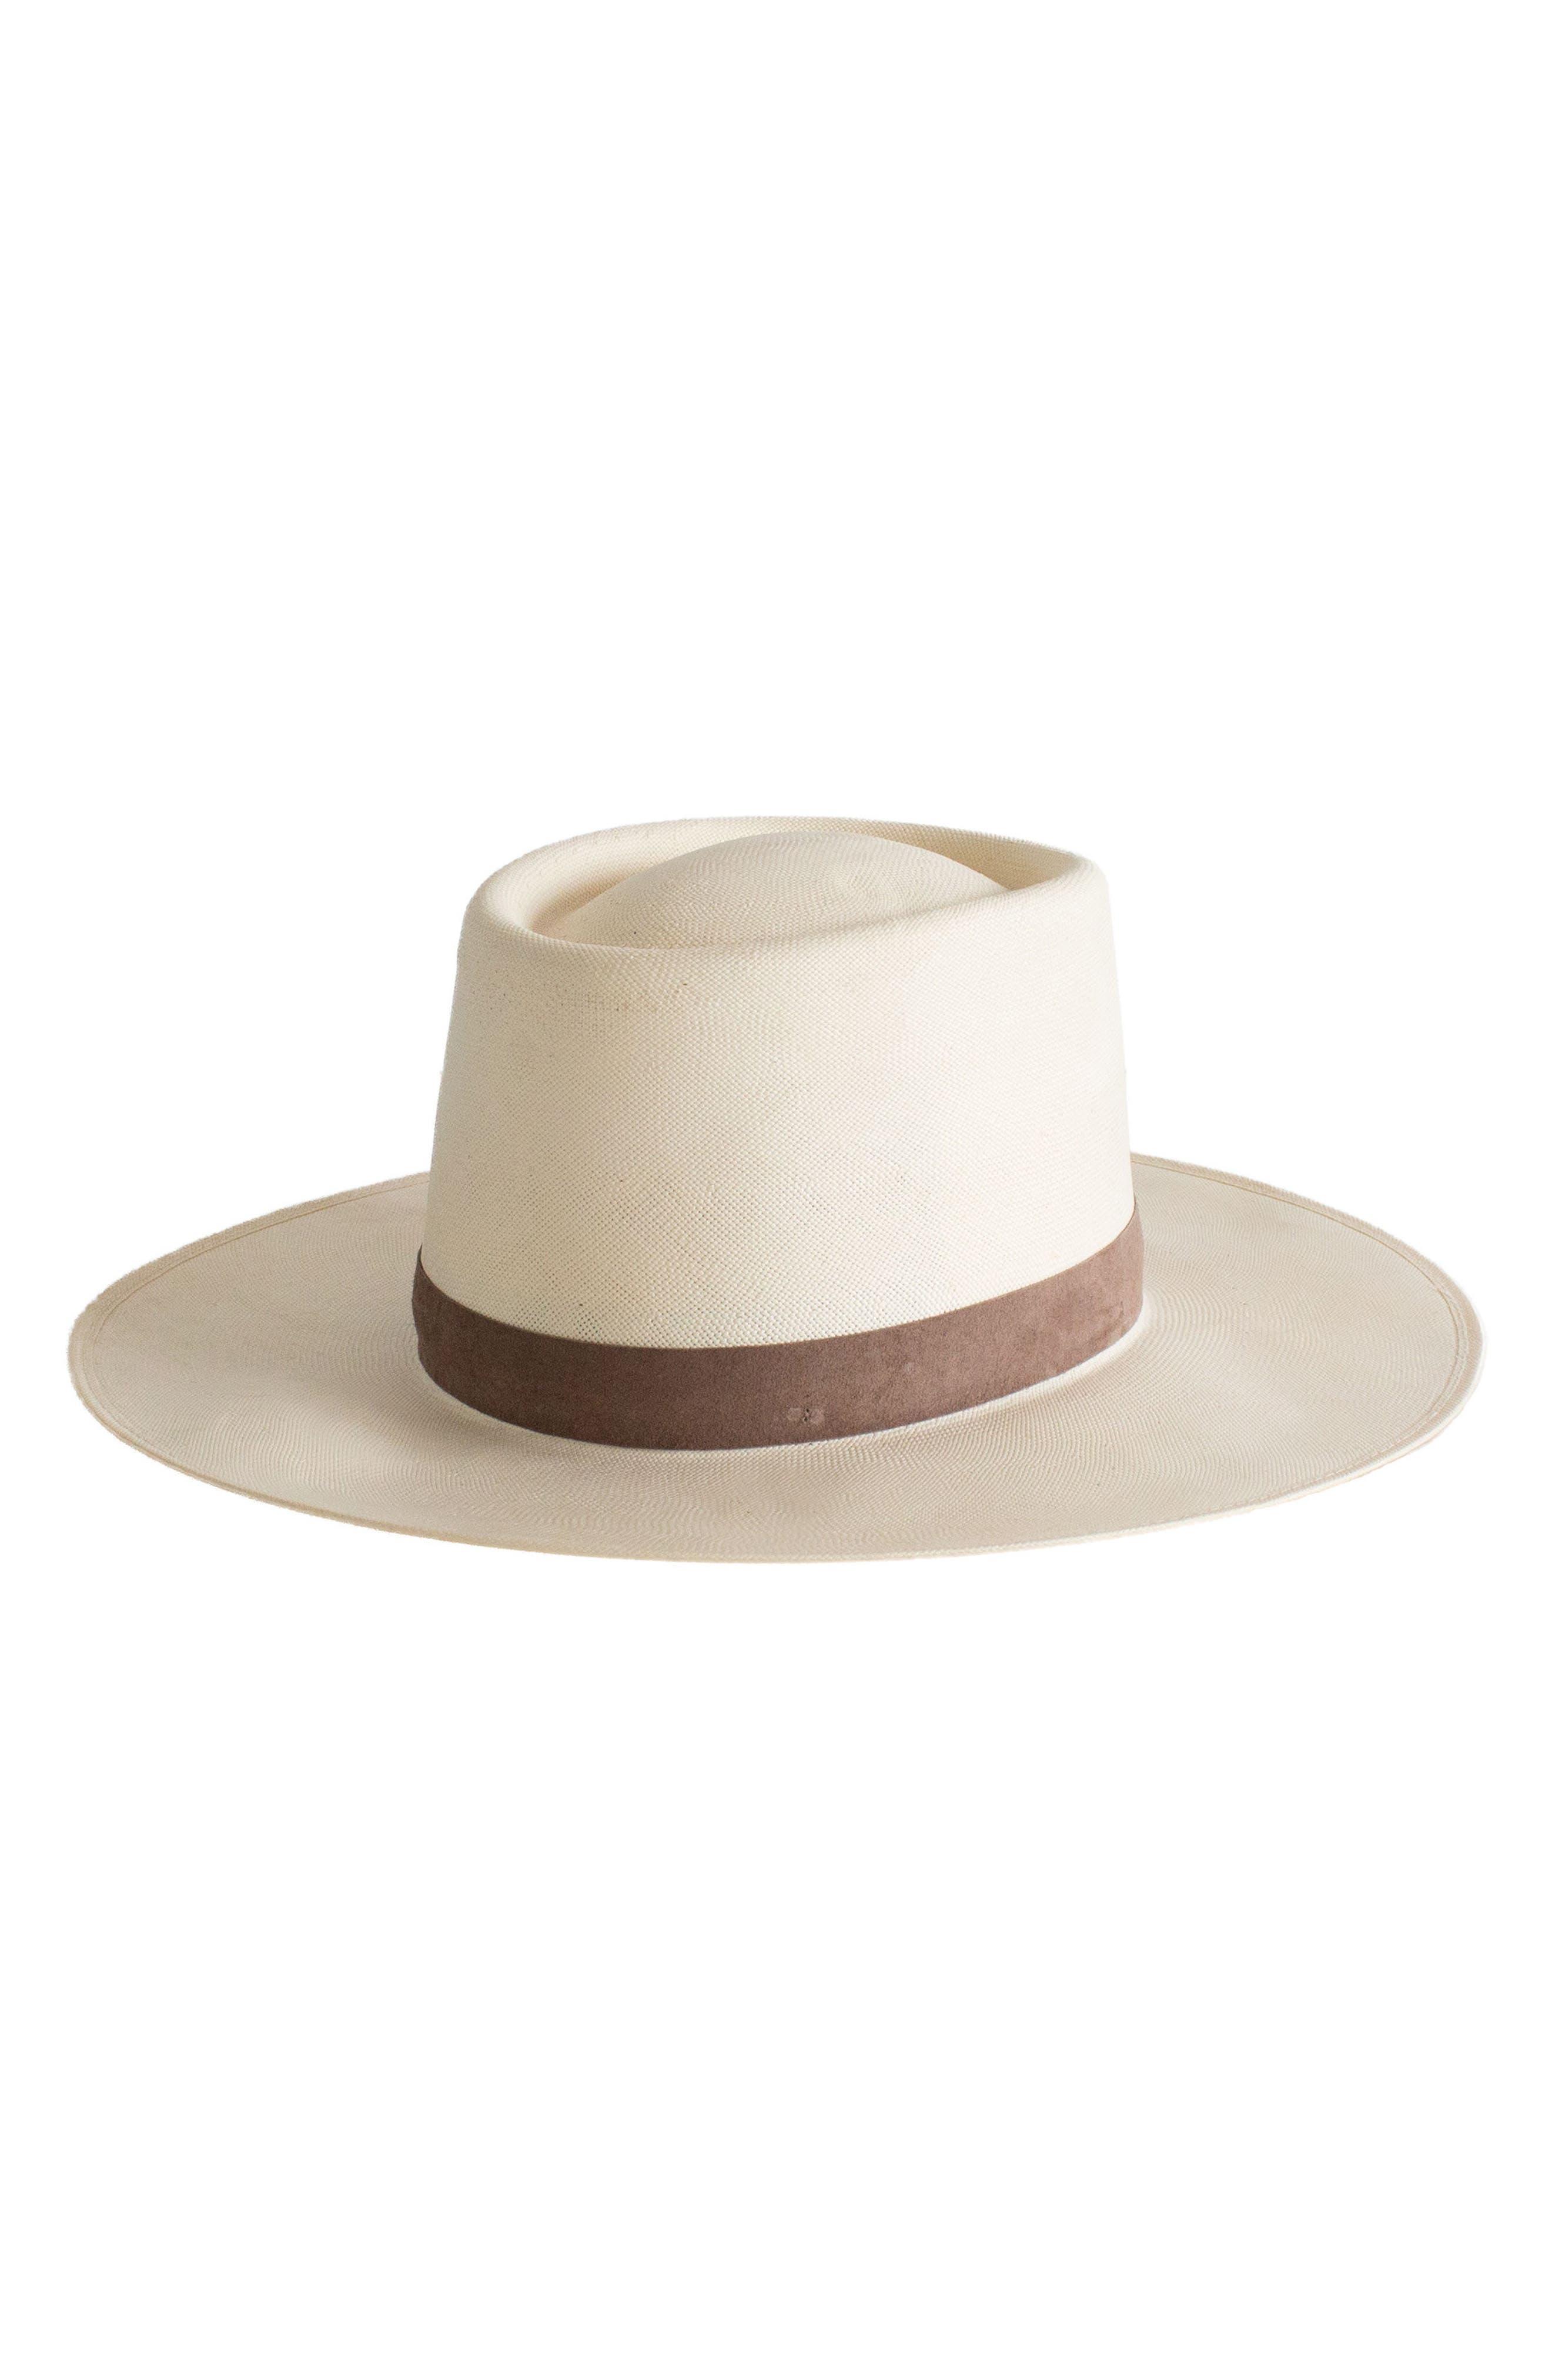 Janessa Leone Shea Straw Hat